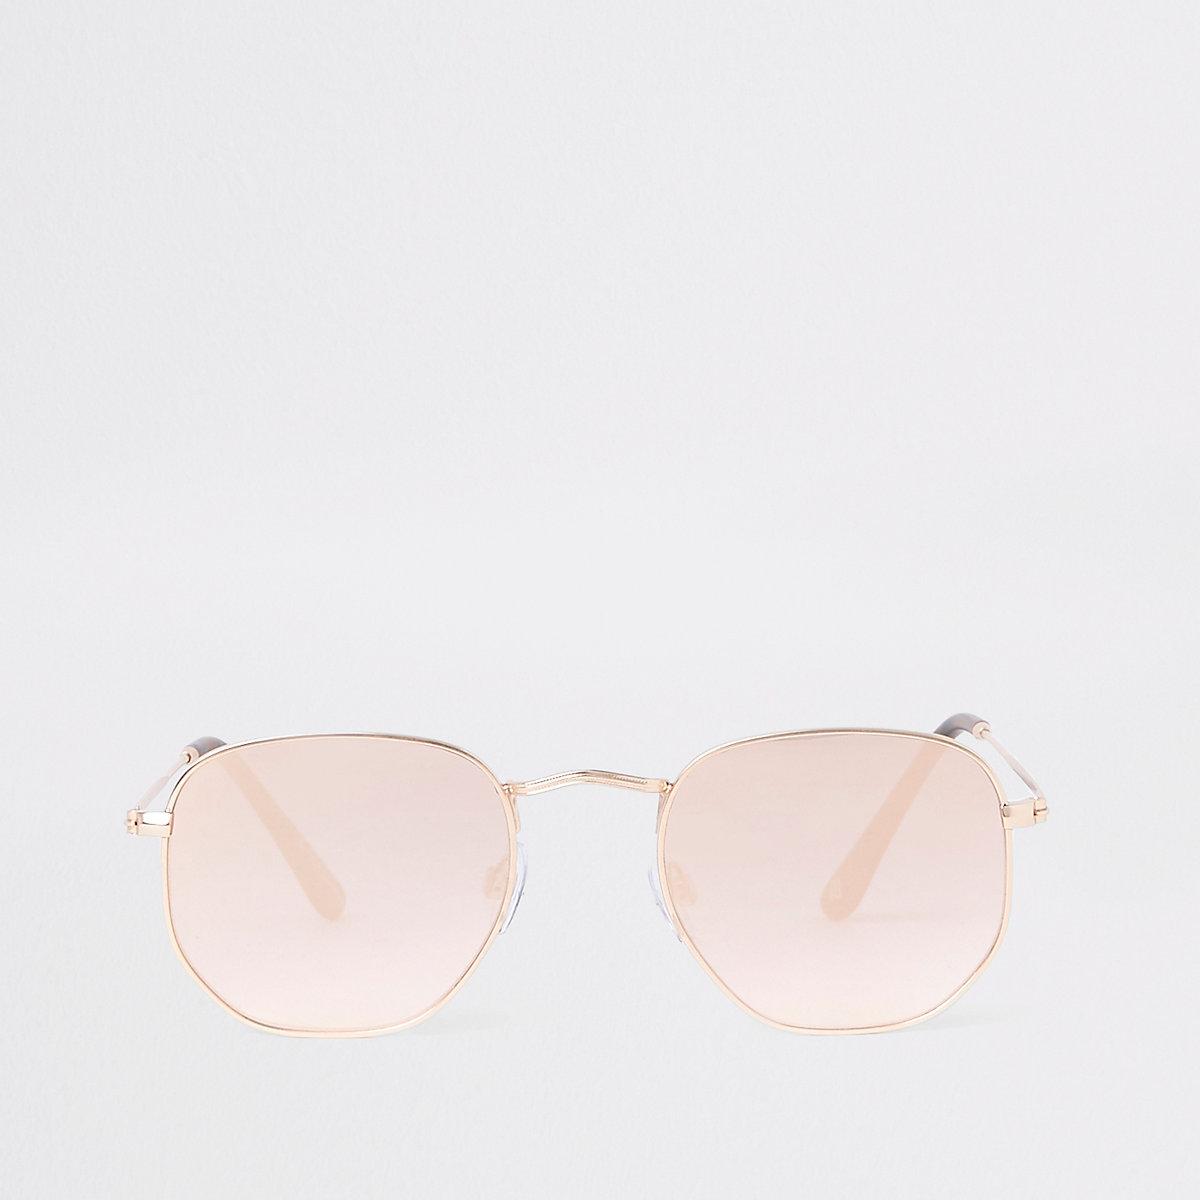 Rose gold revo hex sunglasses